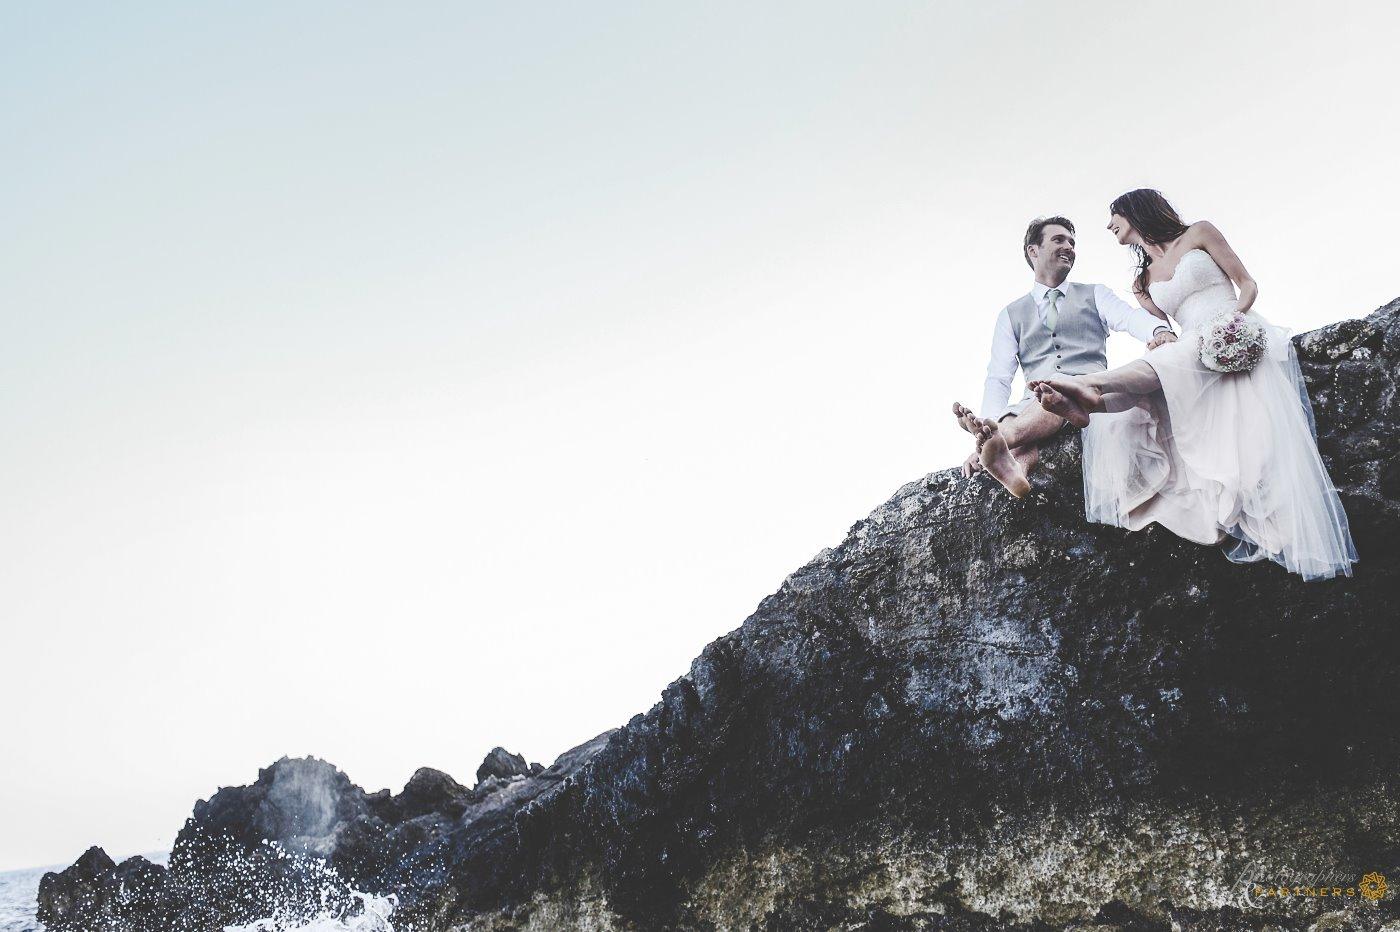 Republic of San Marino Wedding Photographer - Photographers & Partners